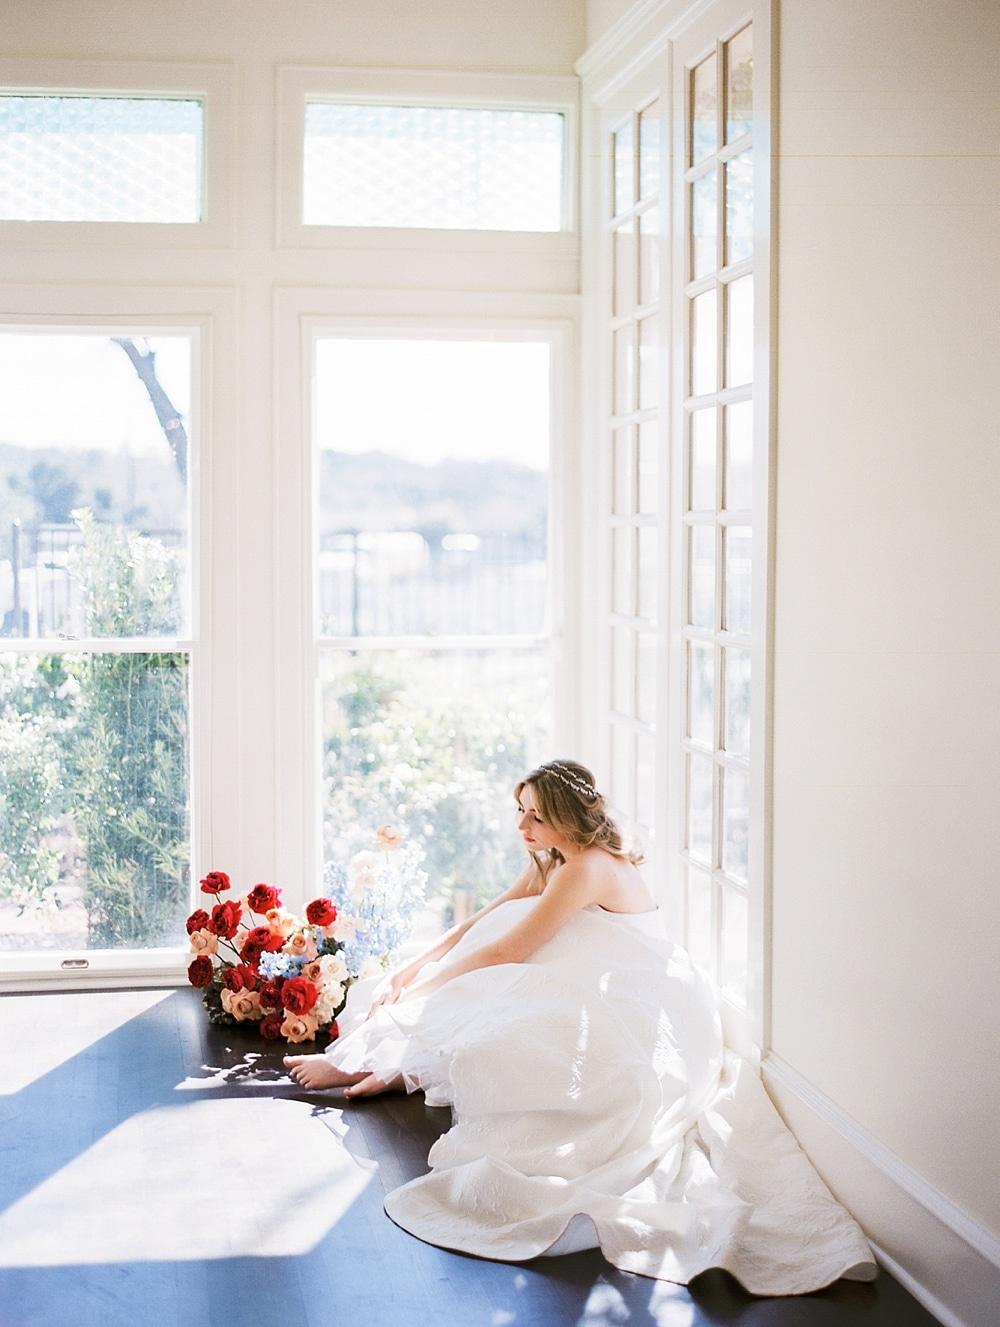 kristin-la-voie-photography-austin-wedding-photographer-woodbine-mansion-150